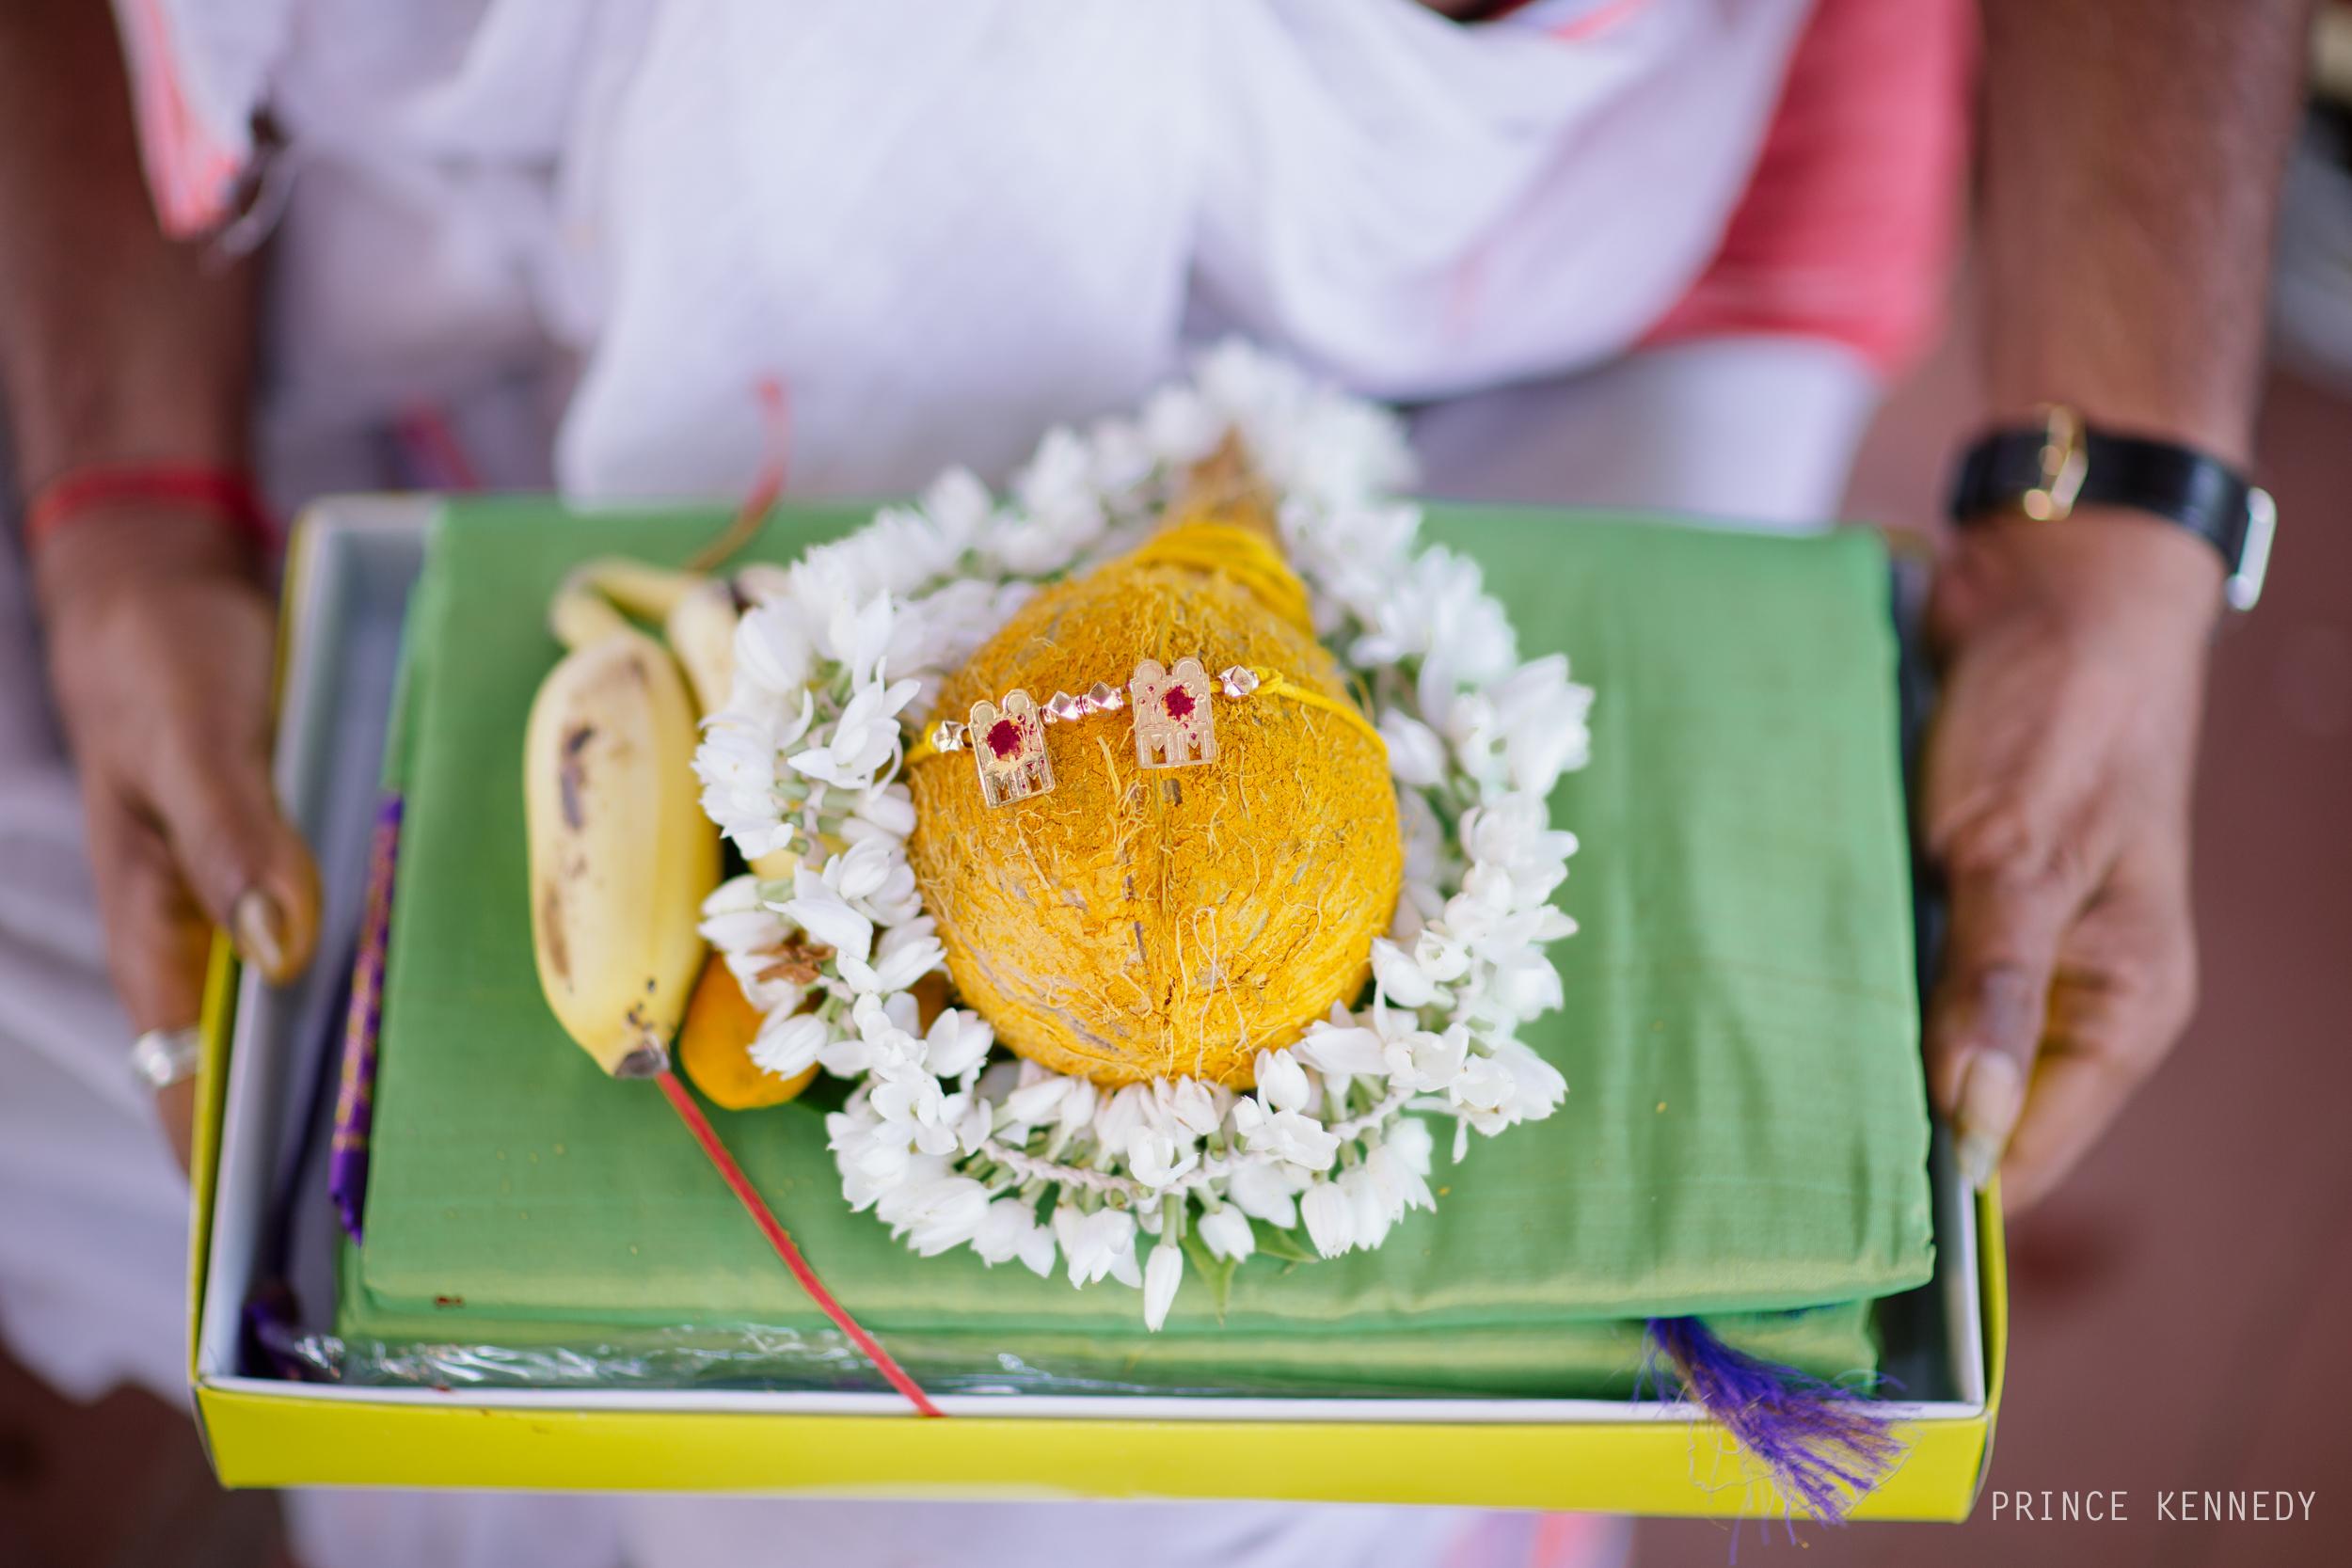 Athmajja-Nithesh-Engagement-Couple-Portrait-Portraiture-Wedding-Couple-Portrait-Chennai-Photographer-Candid-Photography-Destination-Best-Prince-Kennedy-Photography-207.jpg